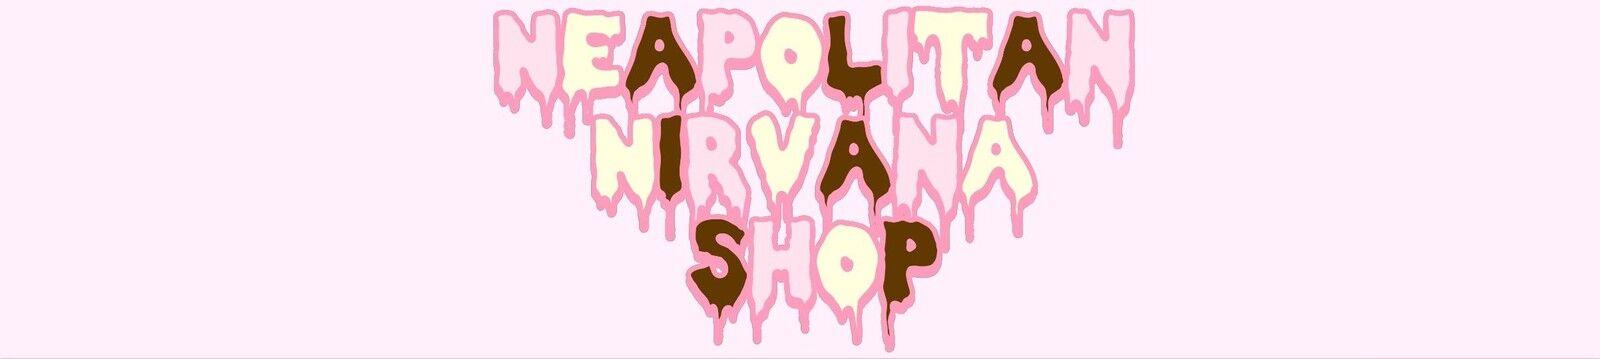 Neapolitan Nirvana Shop